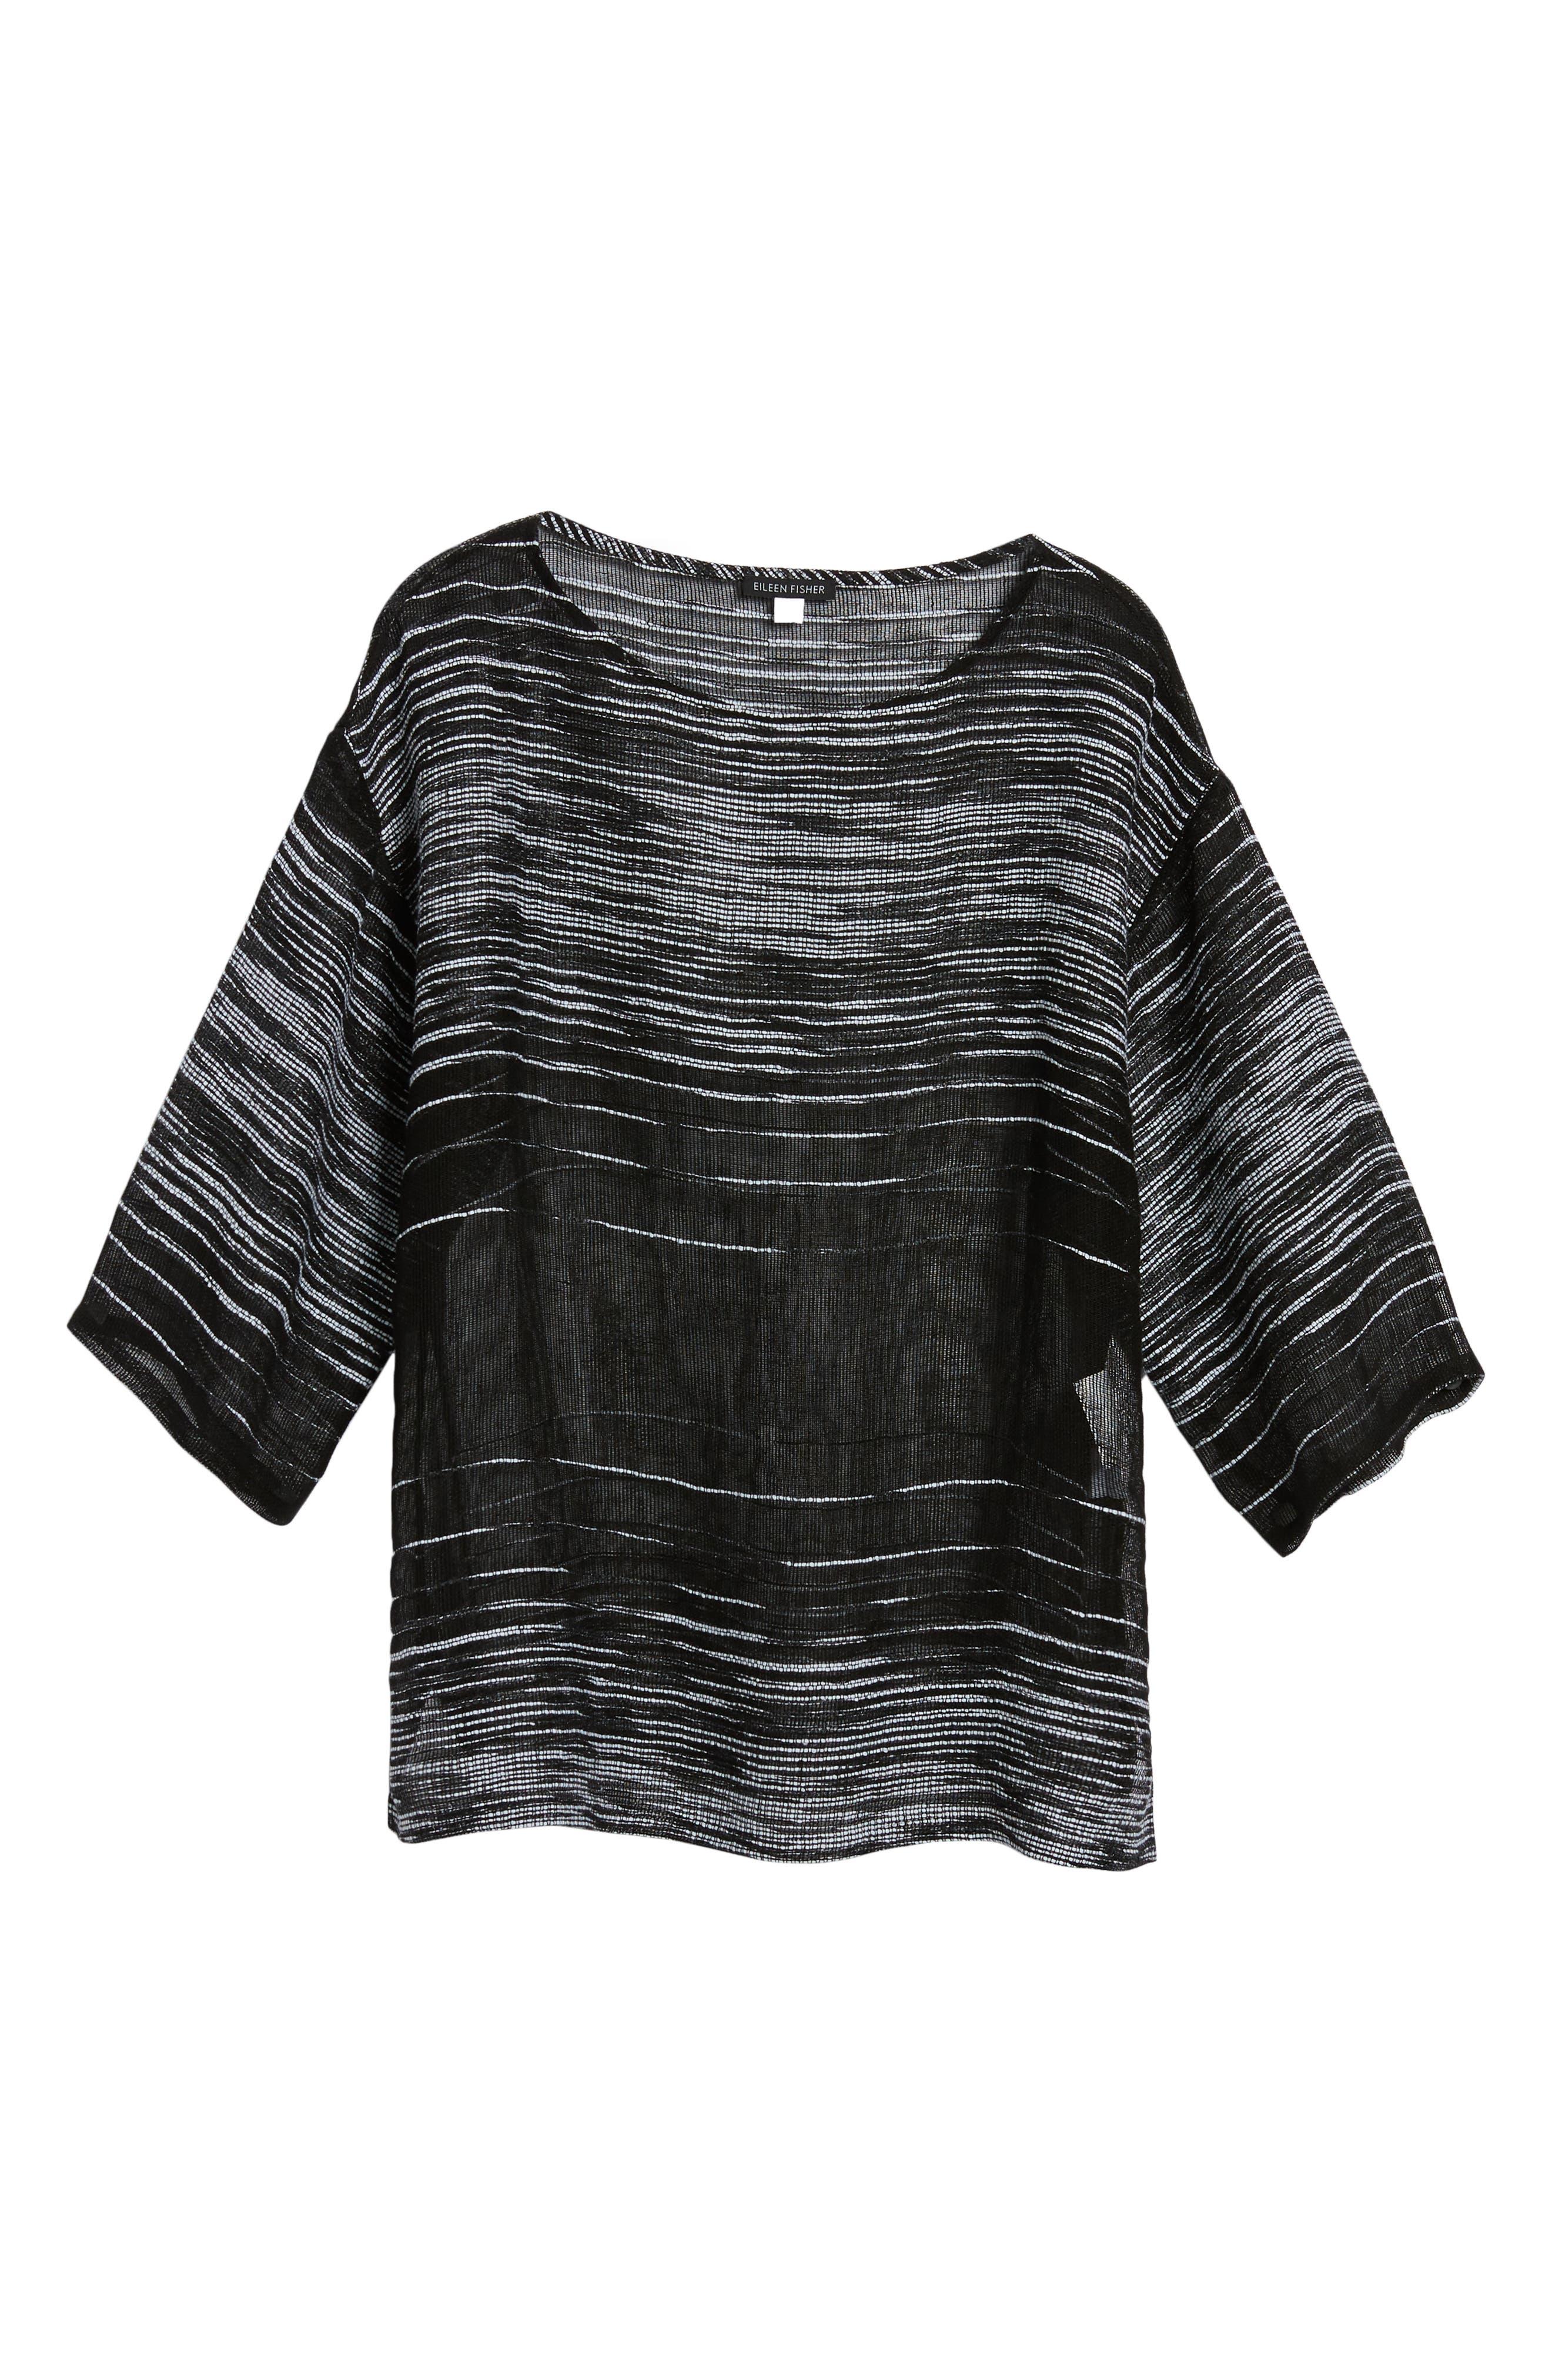 Organic Linen Blend Top,                             Alternate thumbnail 6, color,                             Black